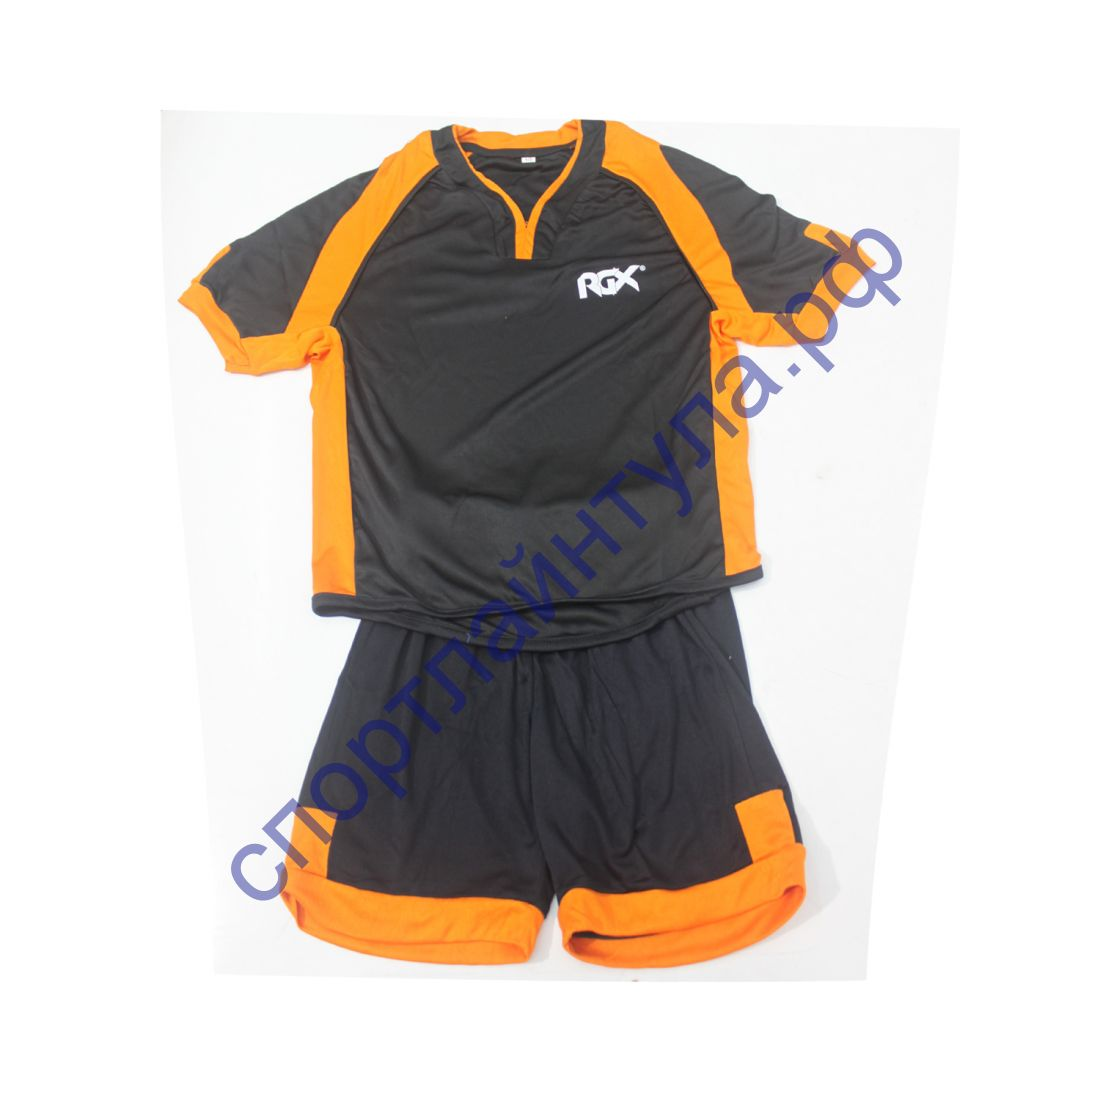 Футбольная форма RGX-FBF02JR Black/Orange